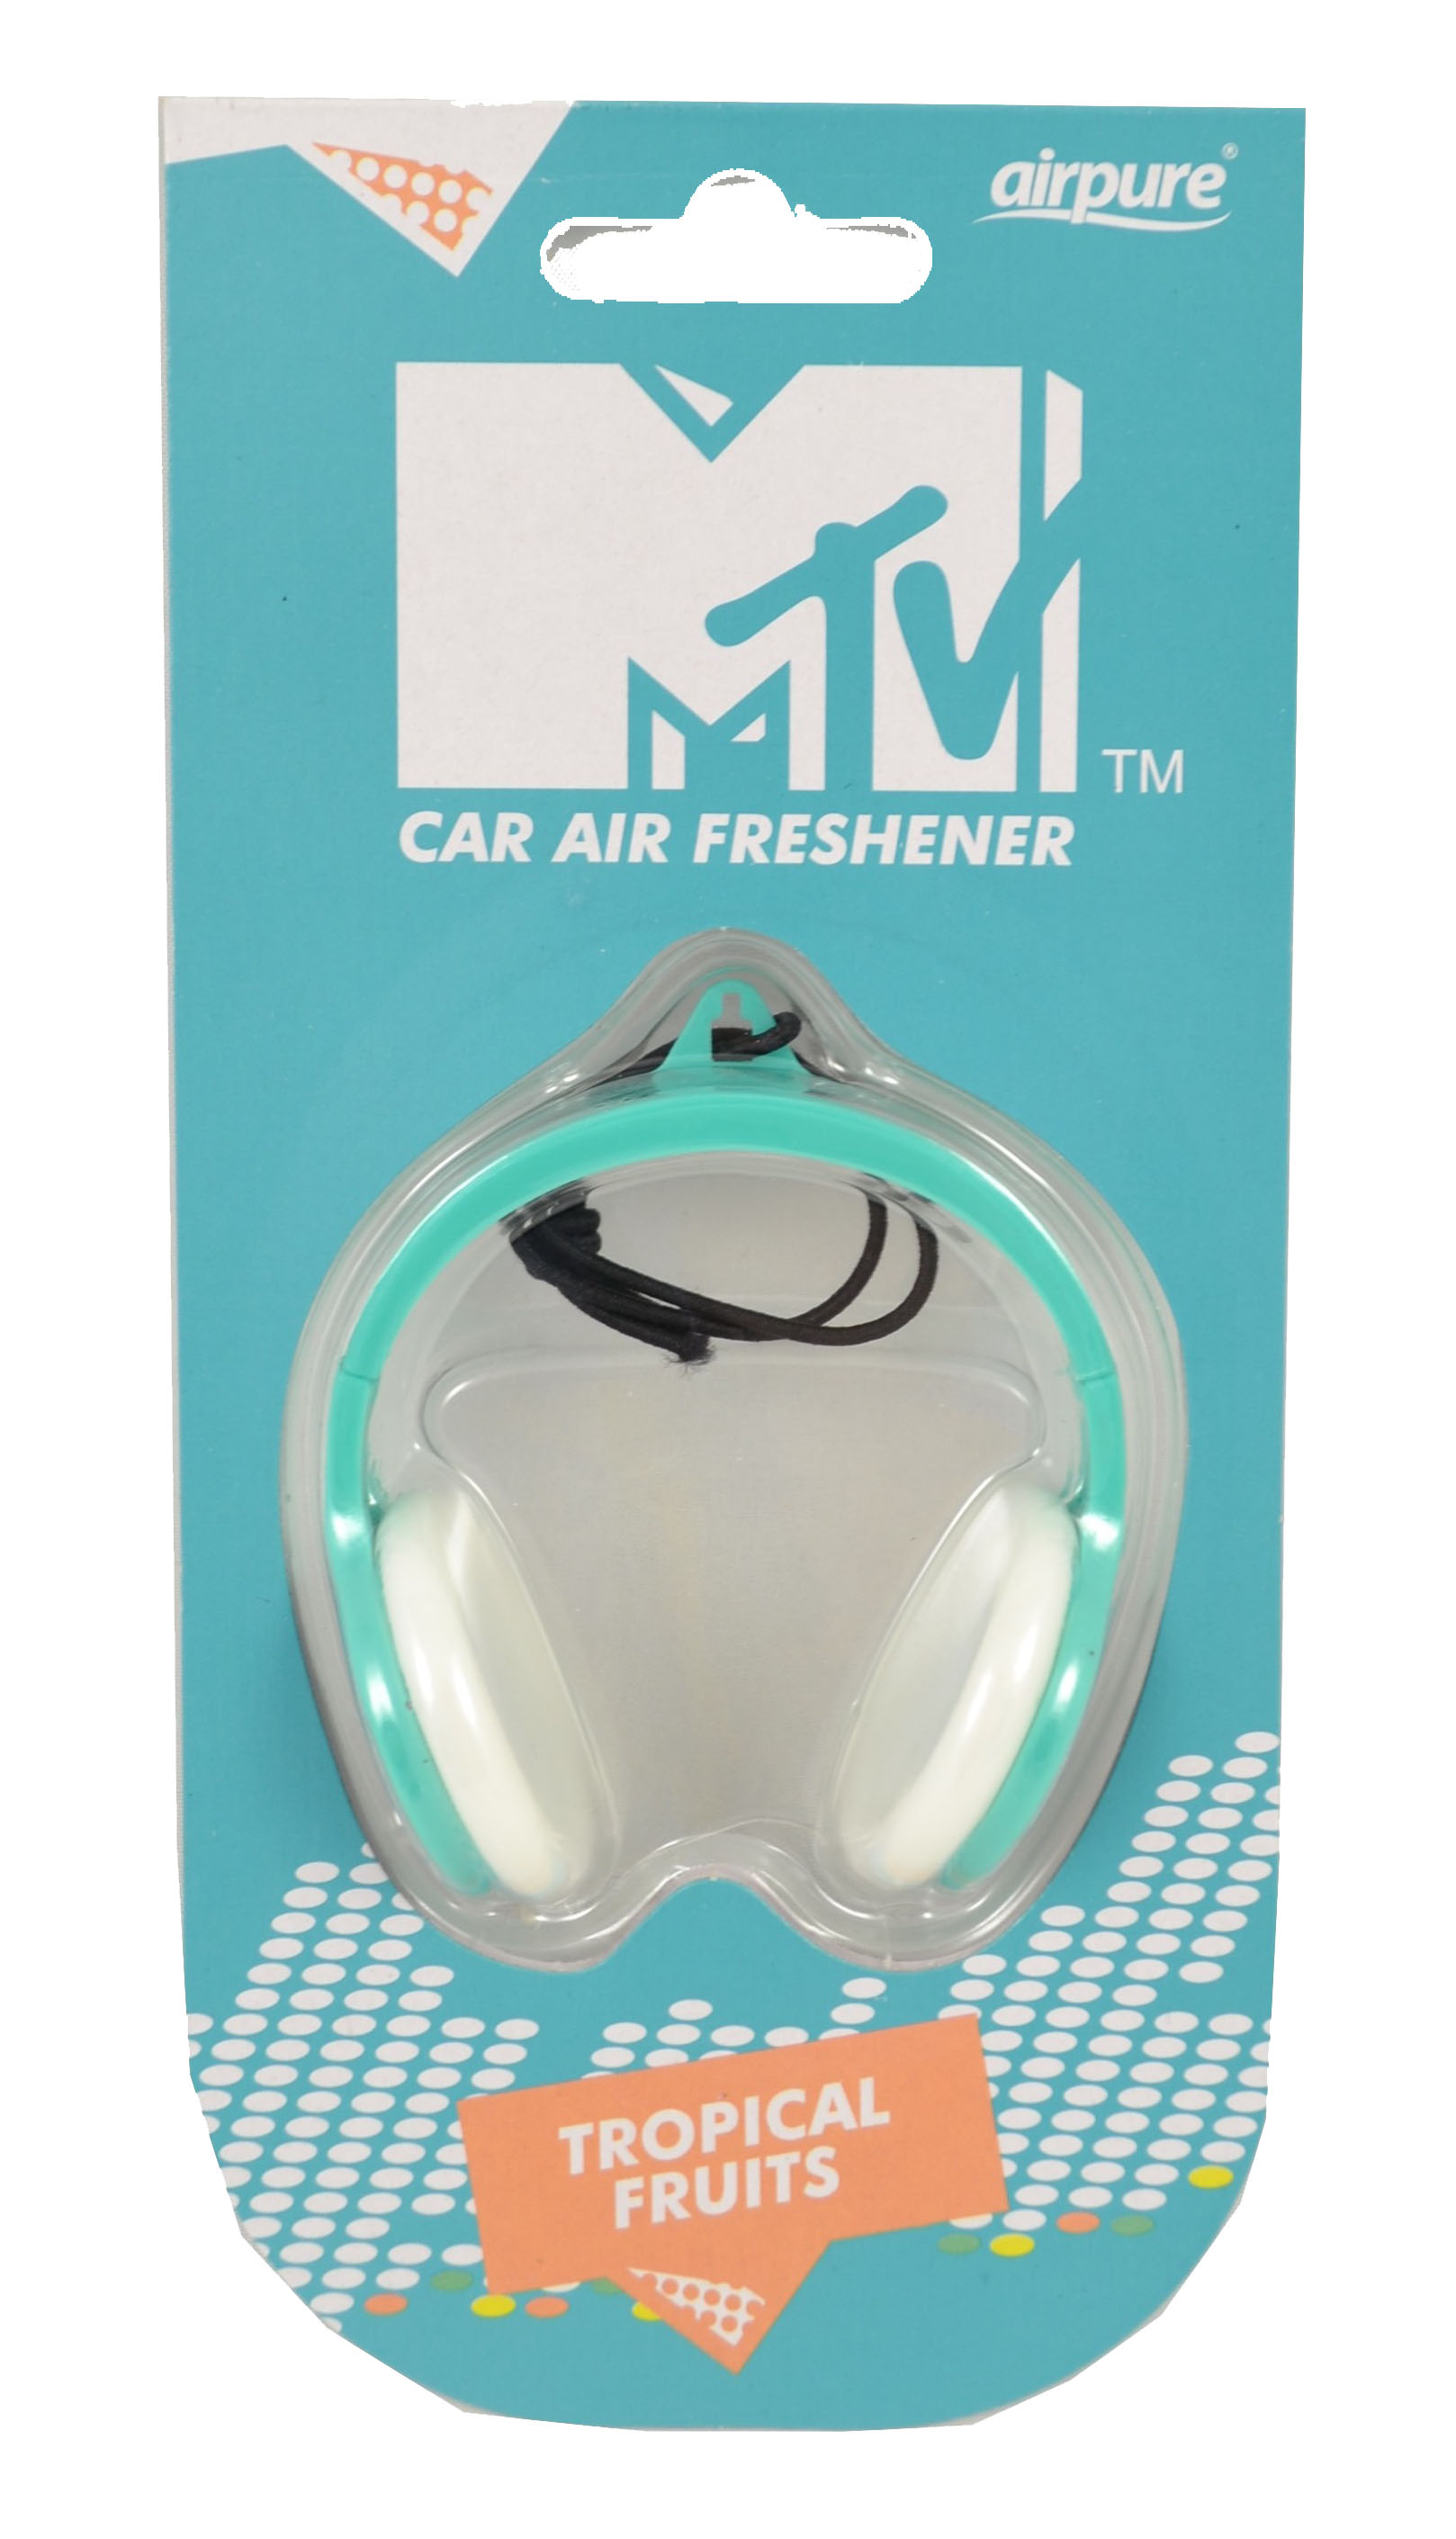 Fotografie Airpure MTV osvěžovač vzduchu do auta Tropical Fruits